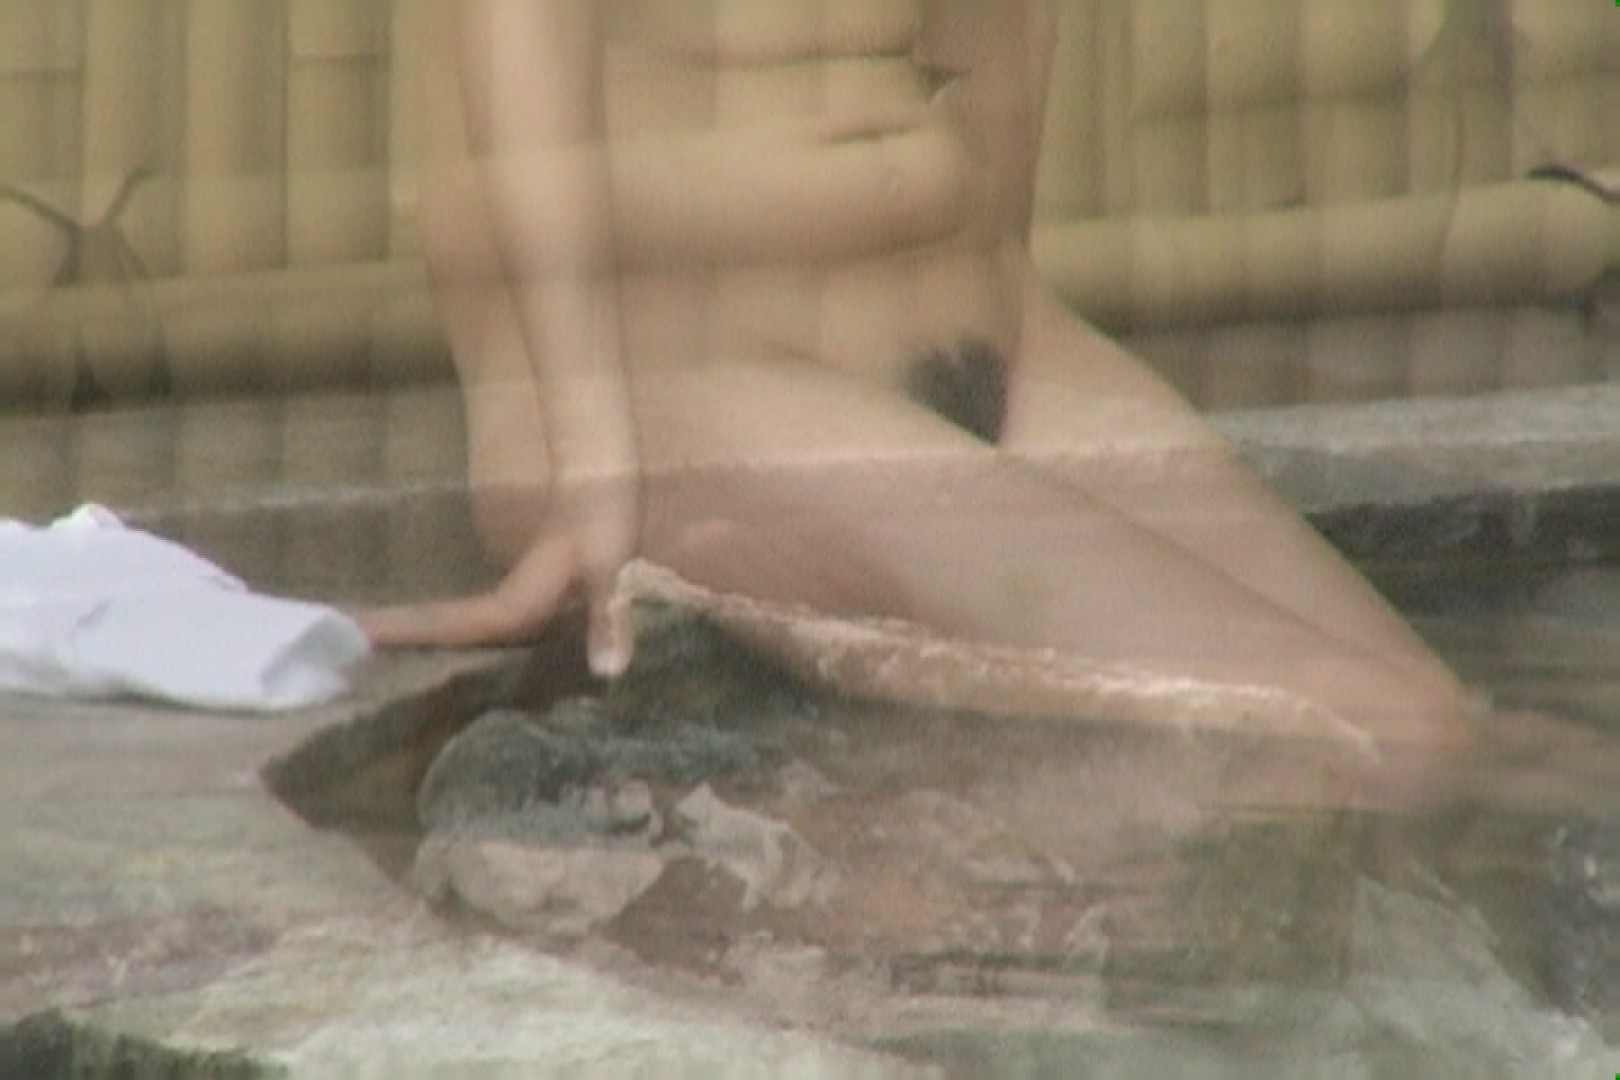 Aquaな露天風呂Vol.629 露天風呂編  105PIX 42